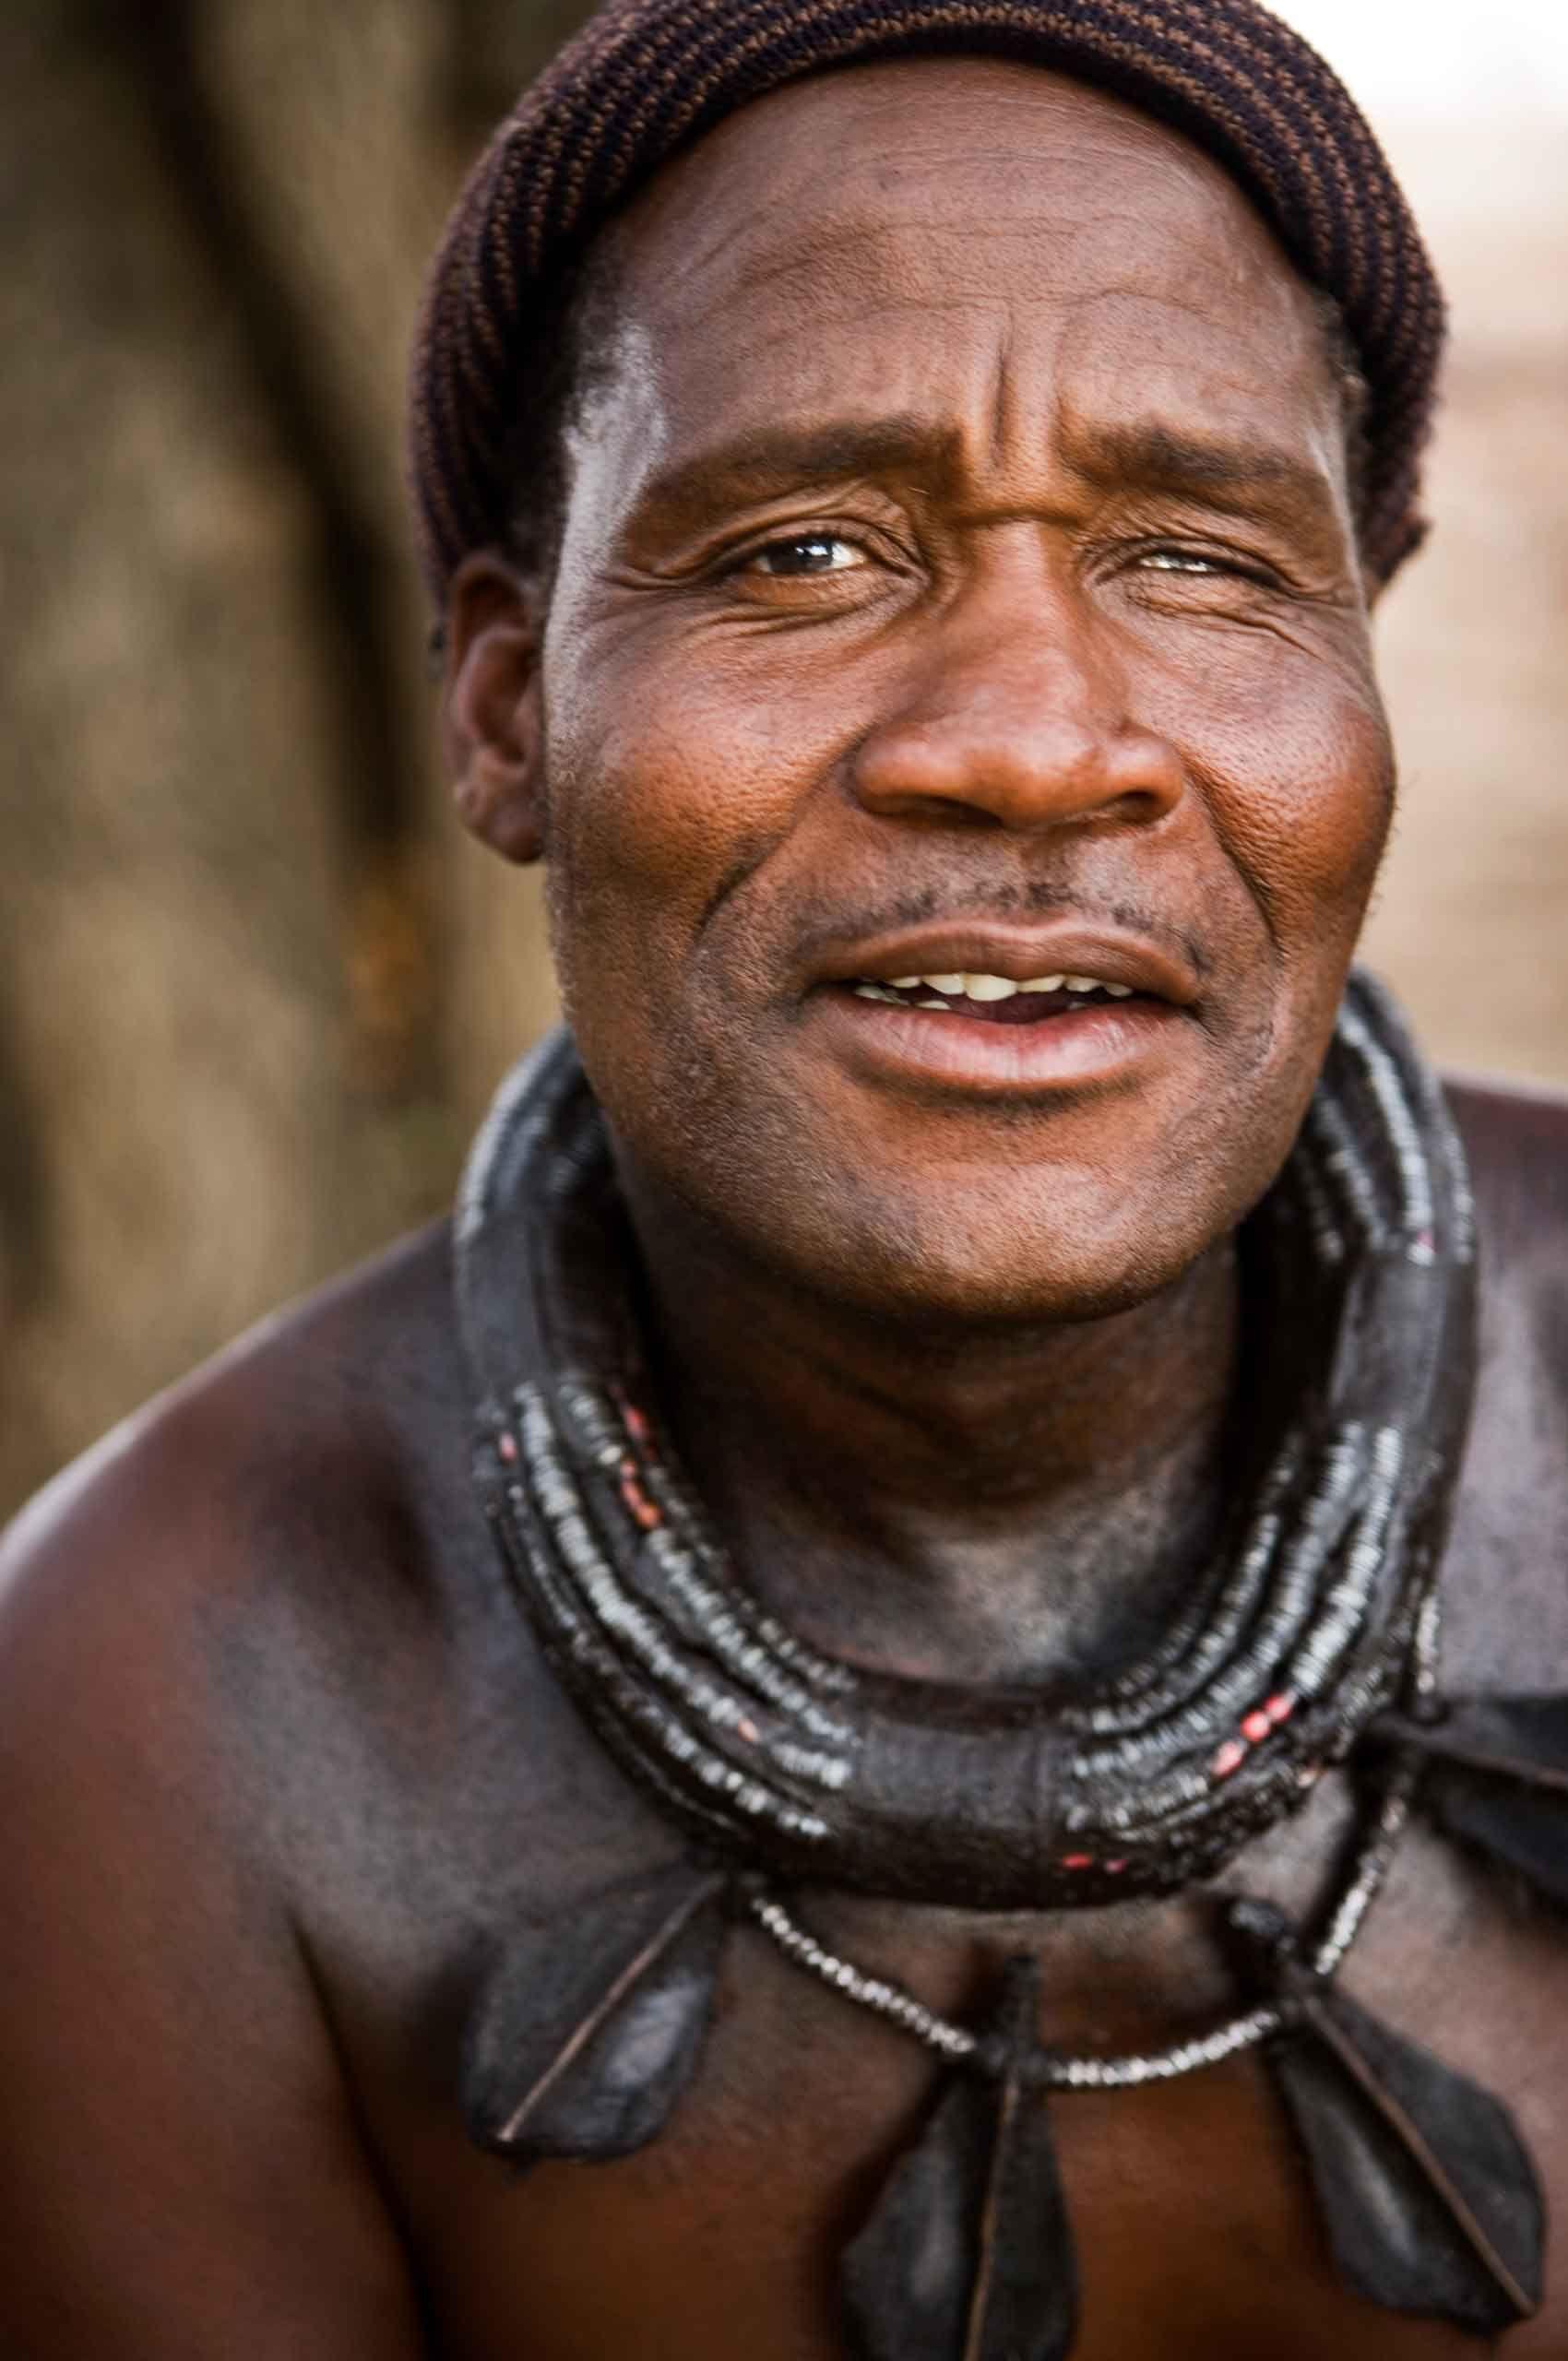 himba-chief-chiposa-namibia-by-henrikolundphotography.jpg